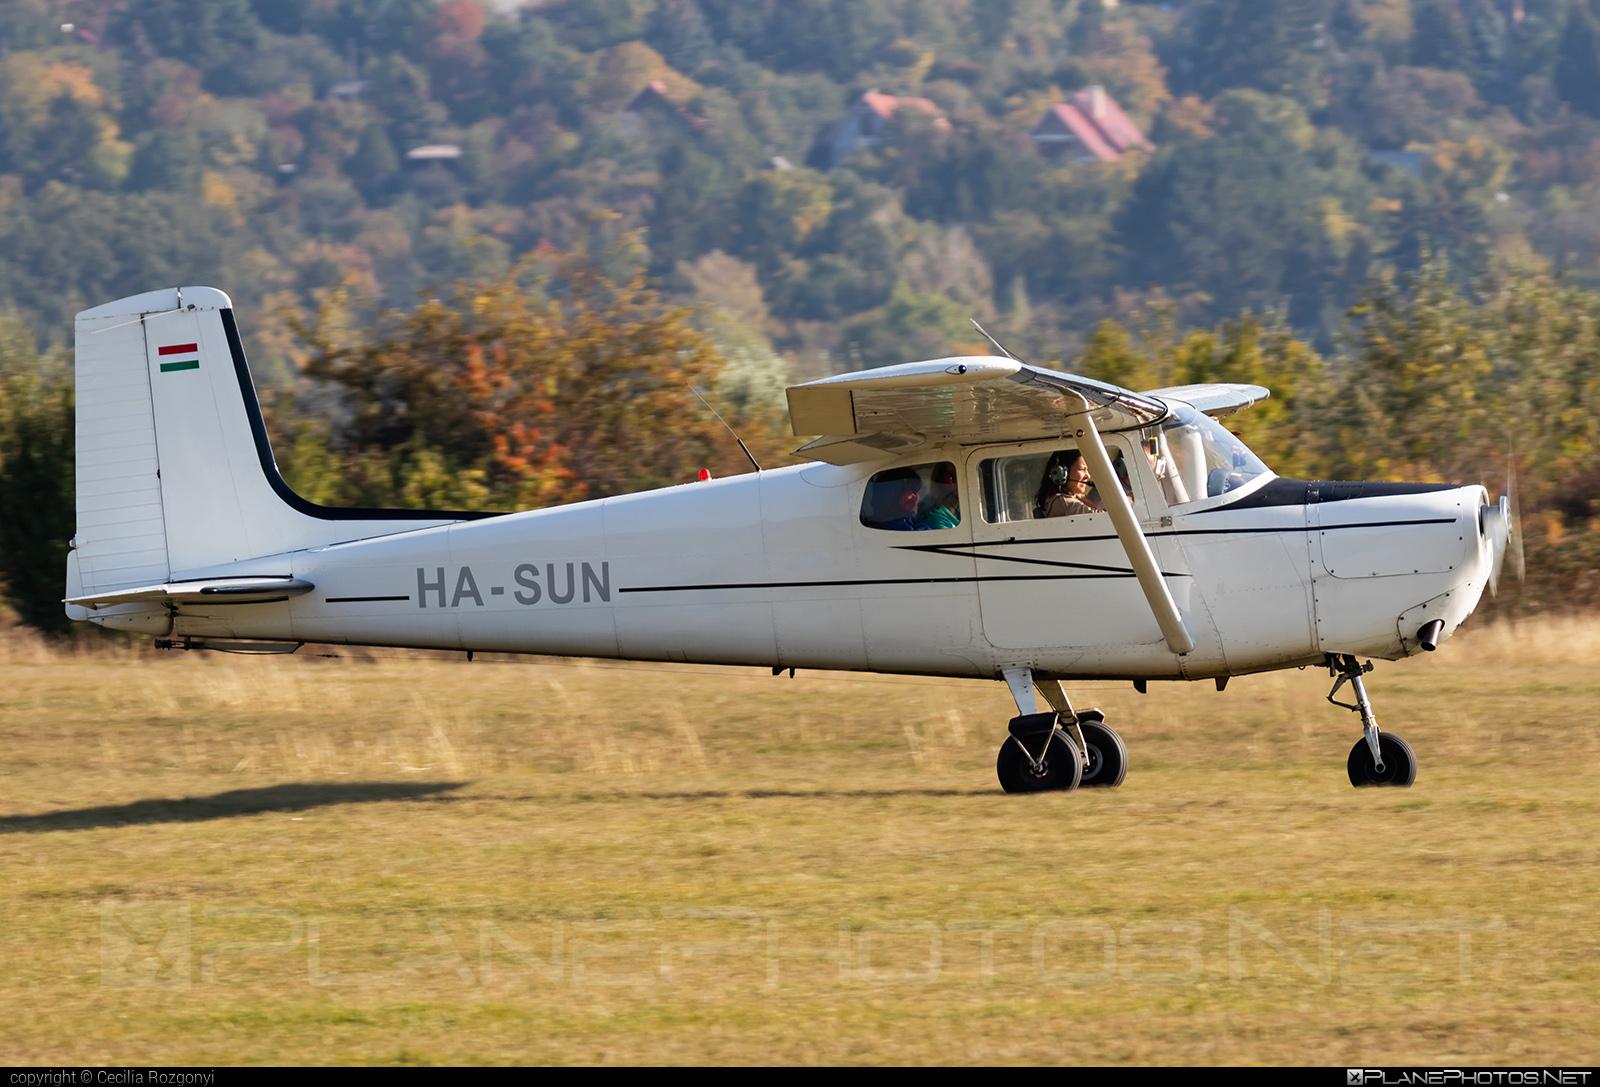 Cessna 172 Skyhawk - HA-SUN operated by Private operator #cessna #cessna172 #cessna172skyhawk #cessnaskyhawk